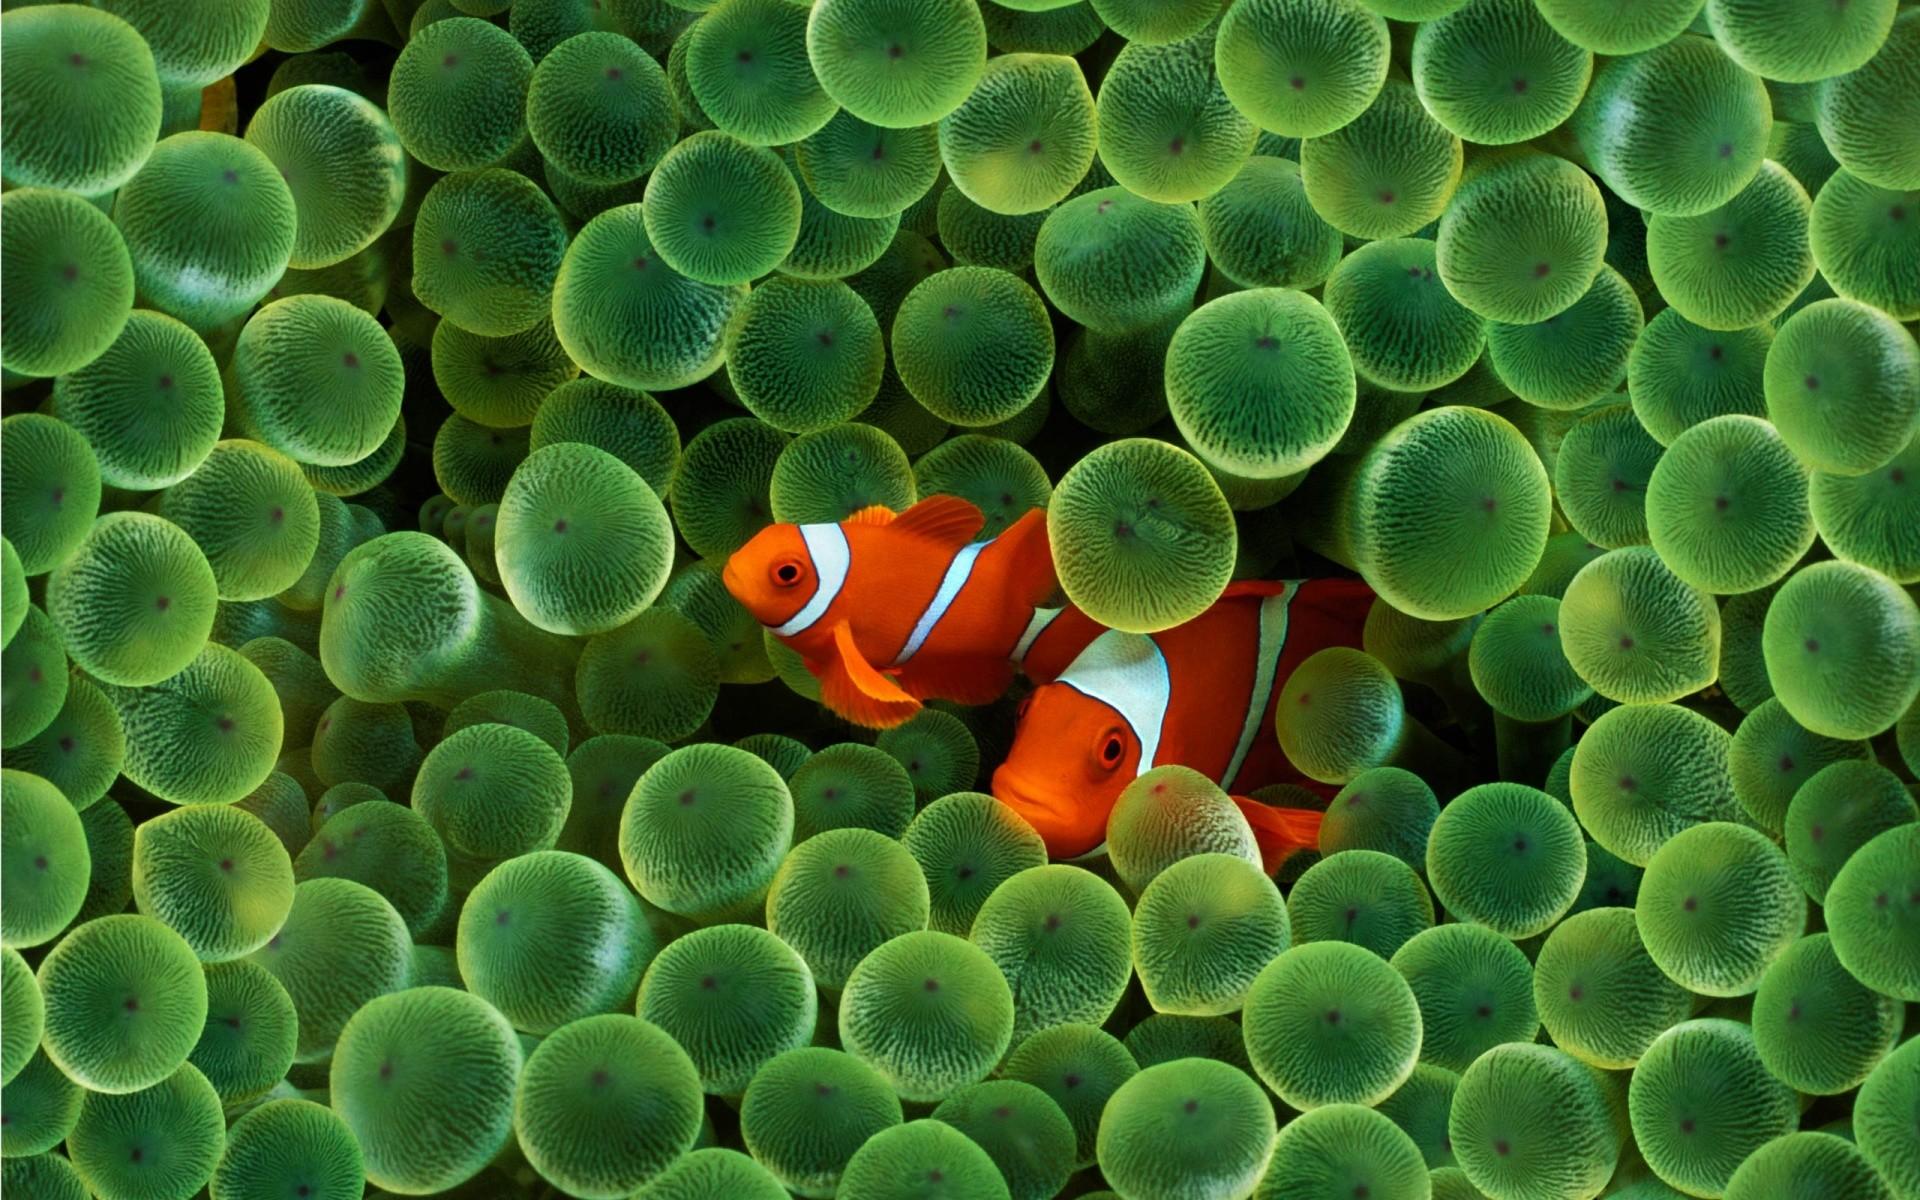 Download Fish Wallpapers wallpaper, 'apple clown fish wallpaper'.